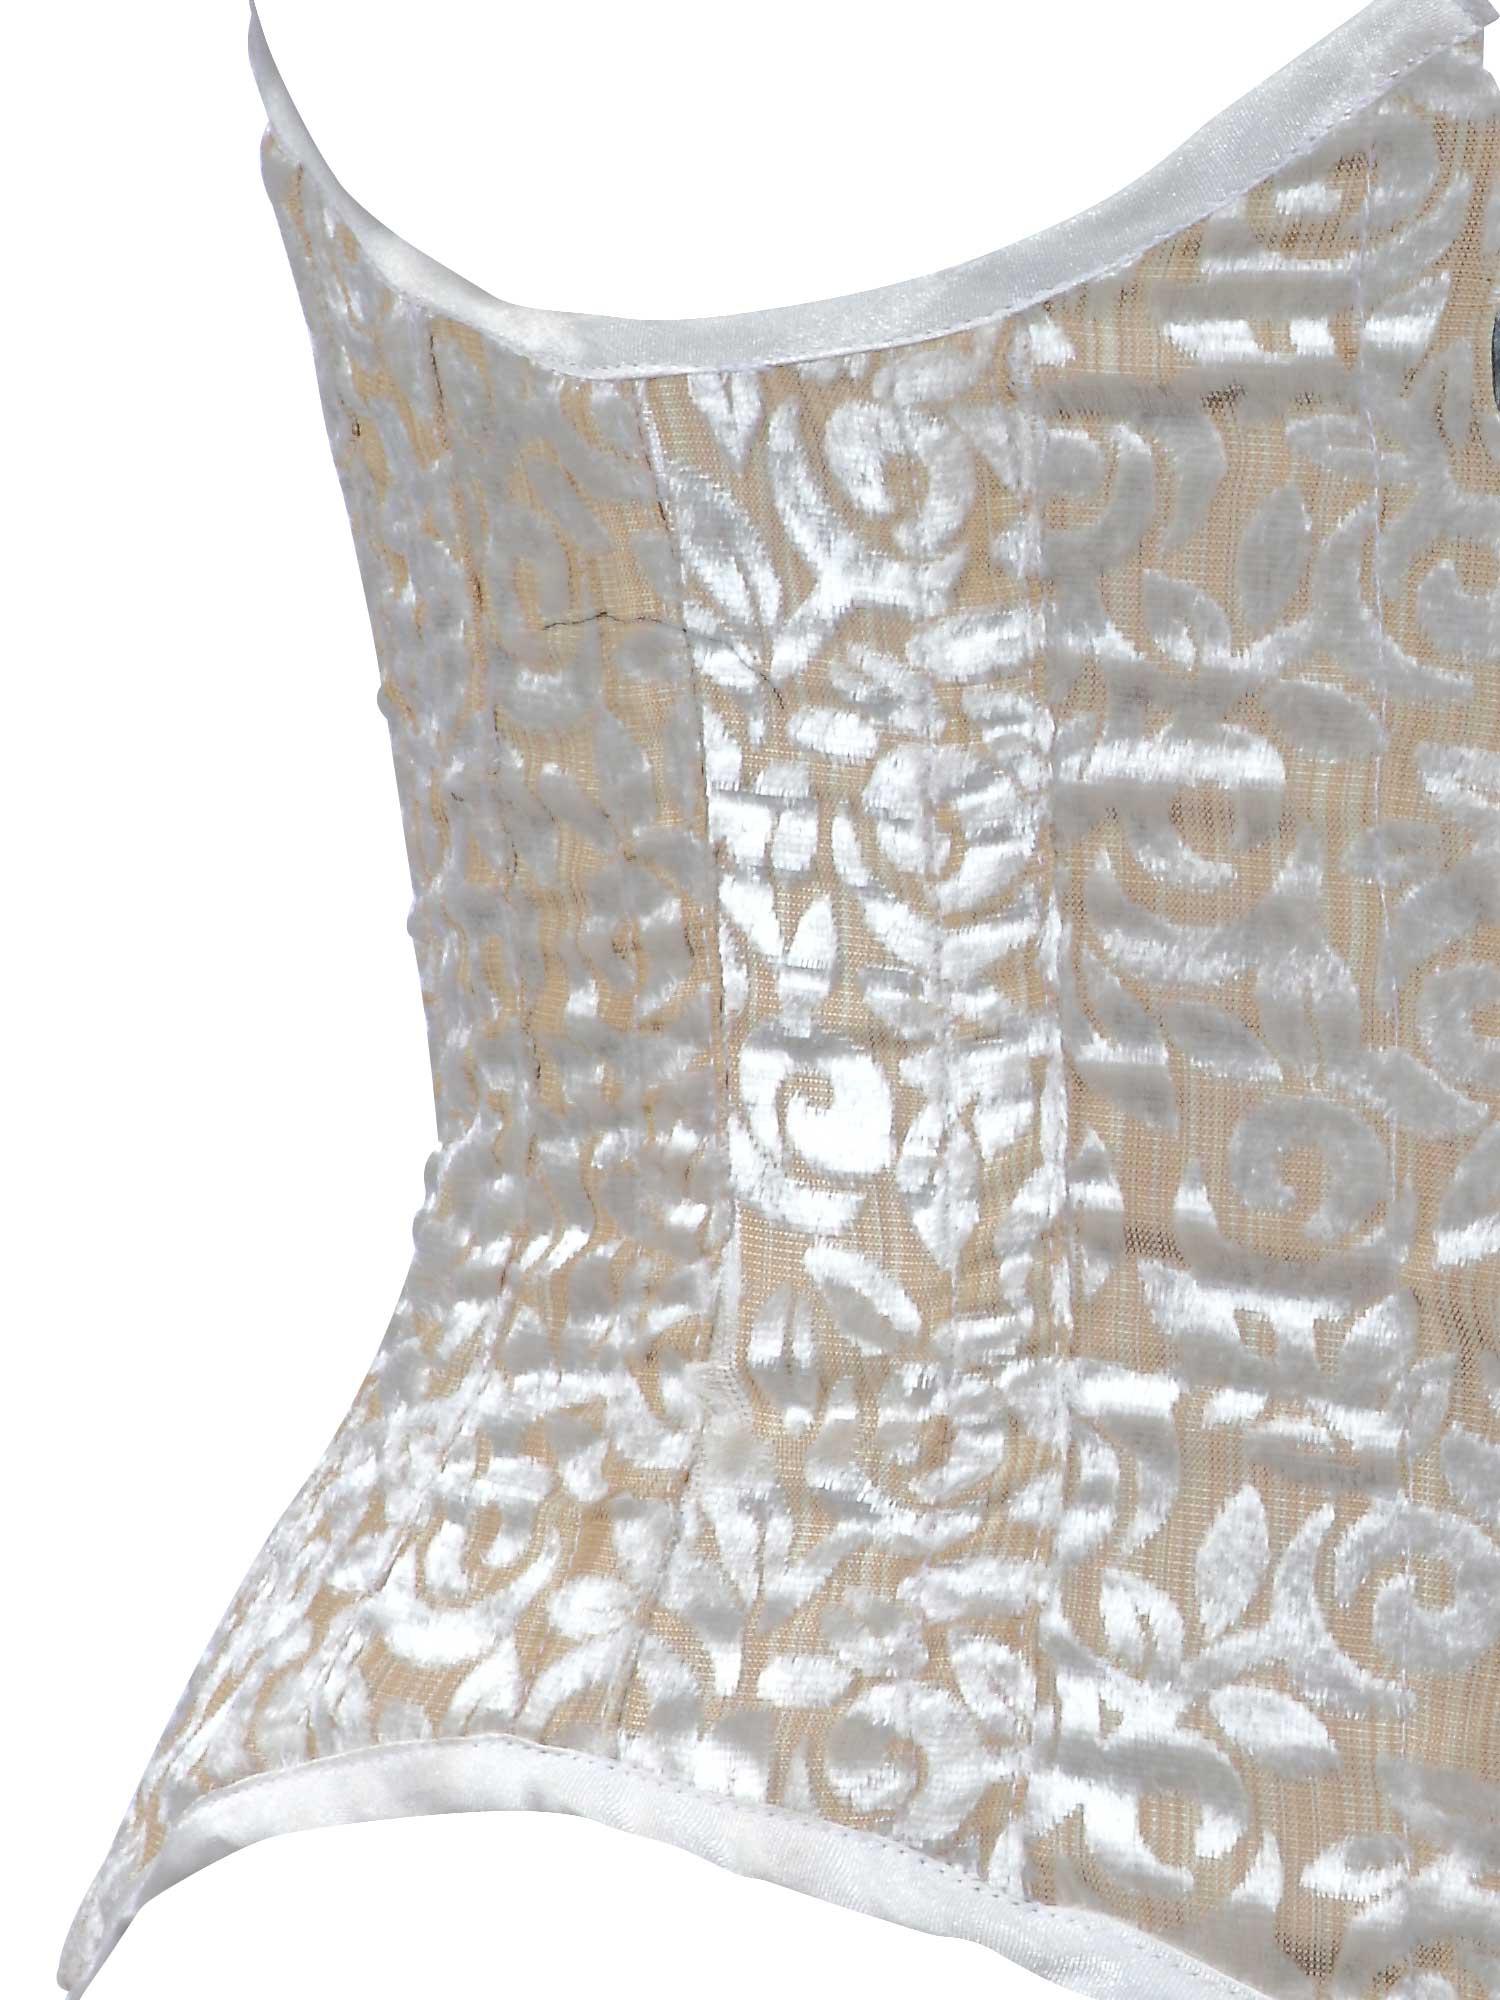 silver_floral_brasso_velvet_fabric_steel_boning_underbust_corset_waist_cincher_bustier_bustiers_and_corsets_2.jpg